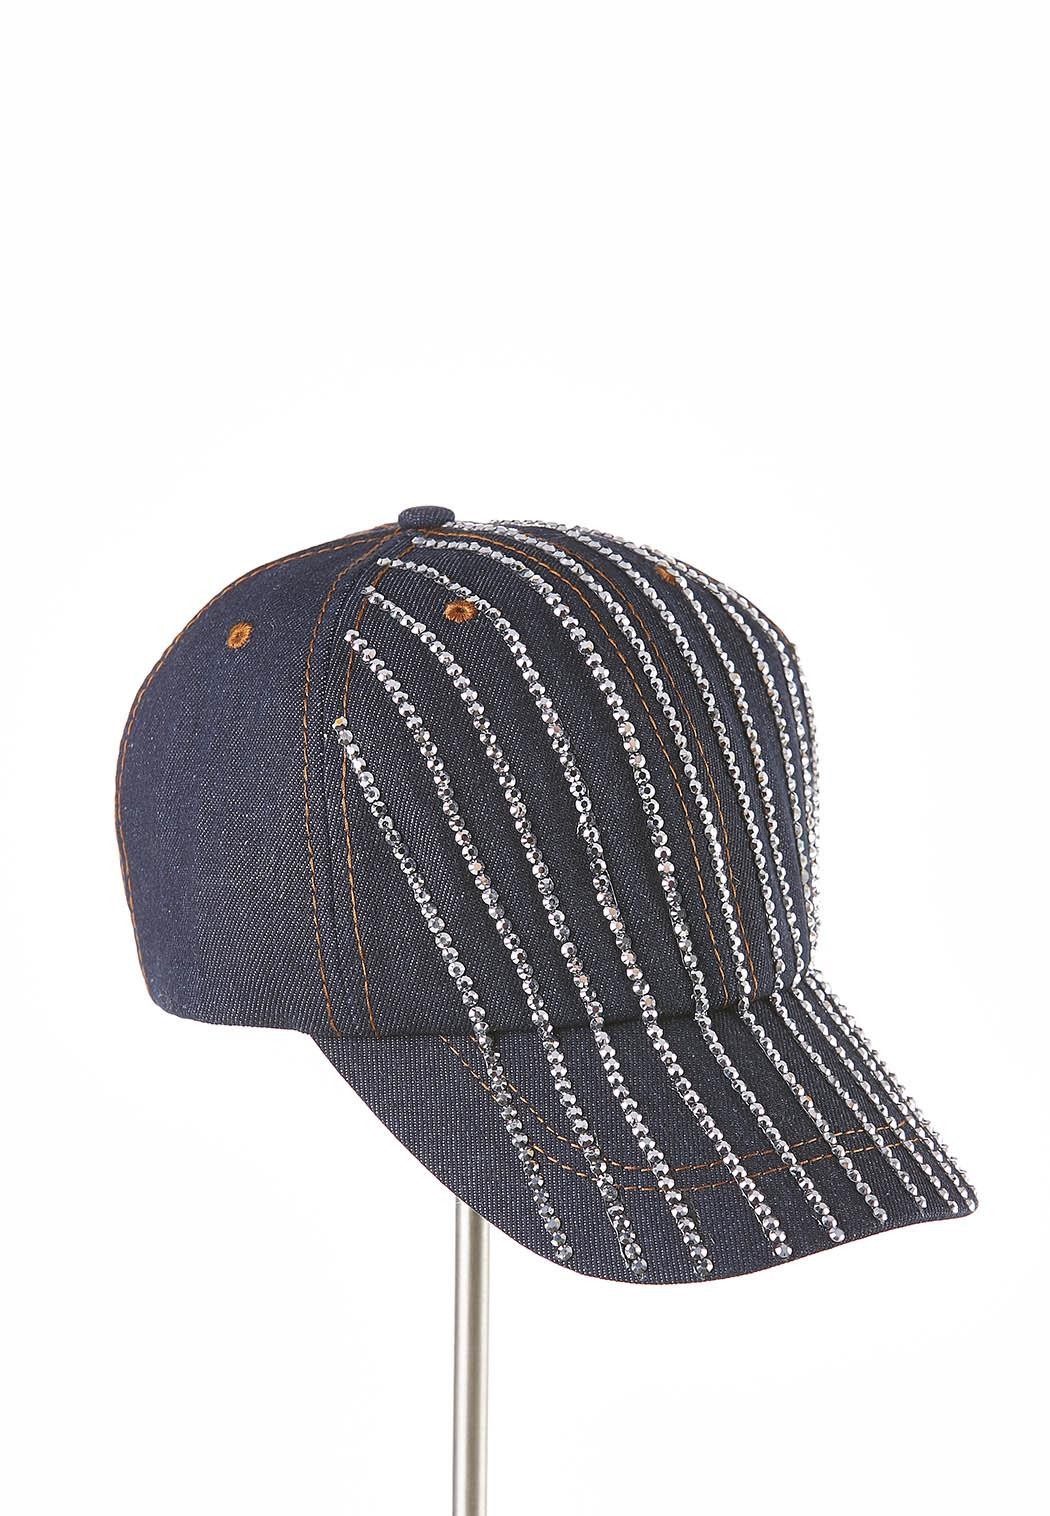 Rhinestone Denim Hat